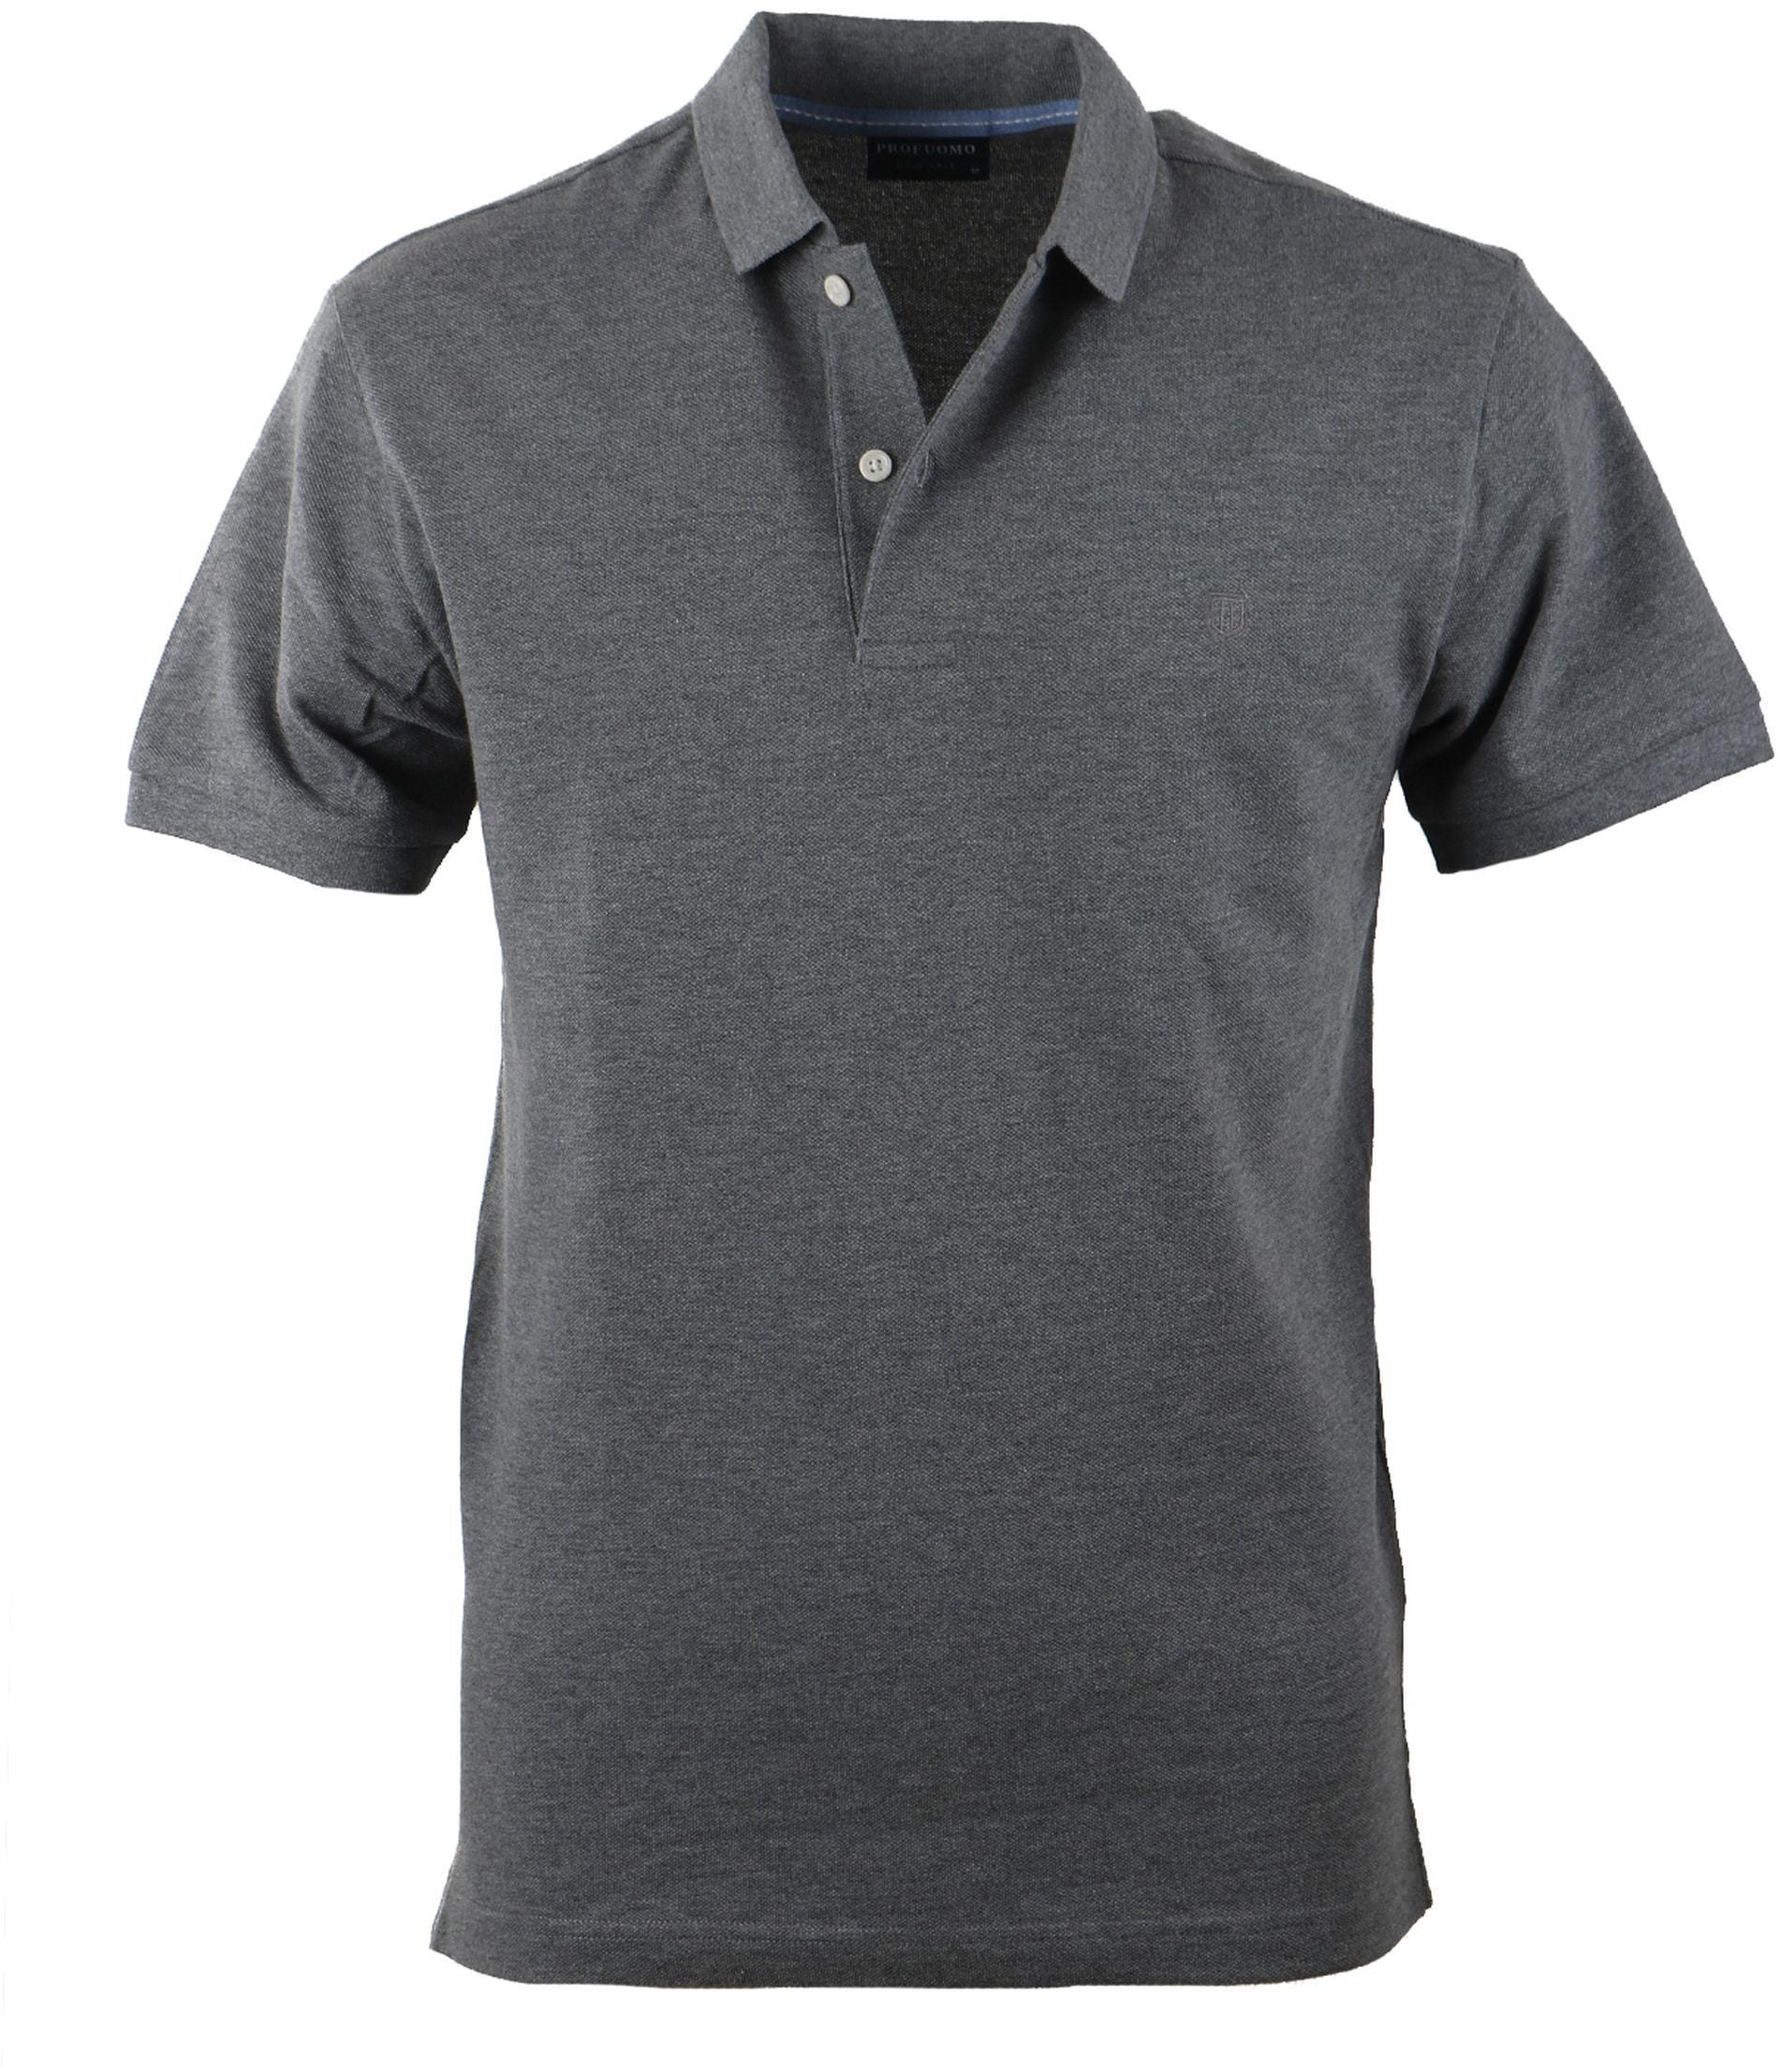 Profuomo Poloshirt Dark Grey Pp3j00016 Order Online Suitable